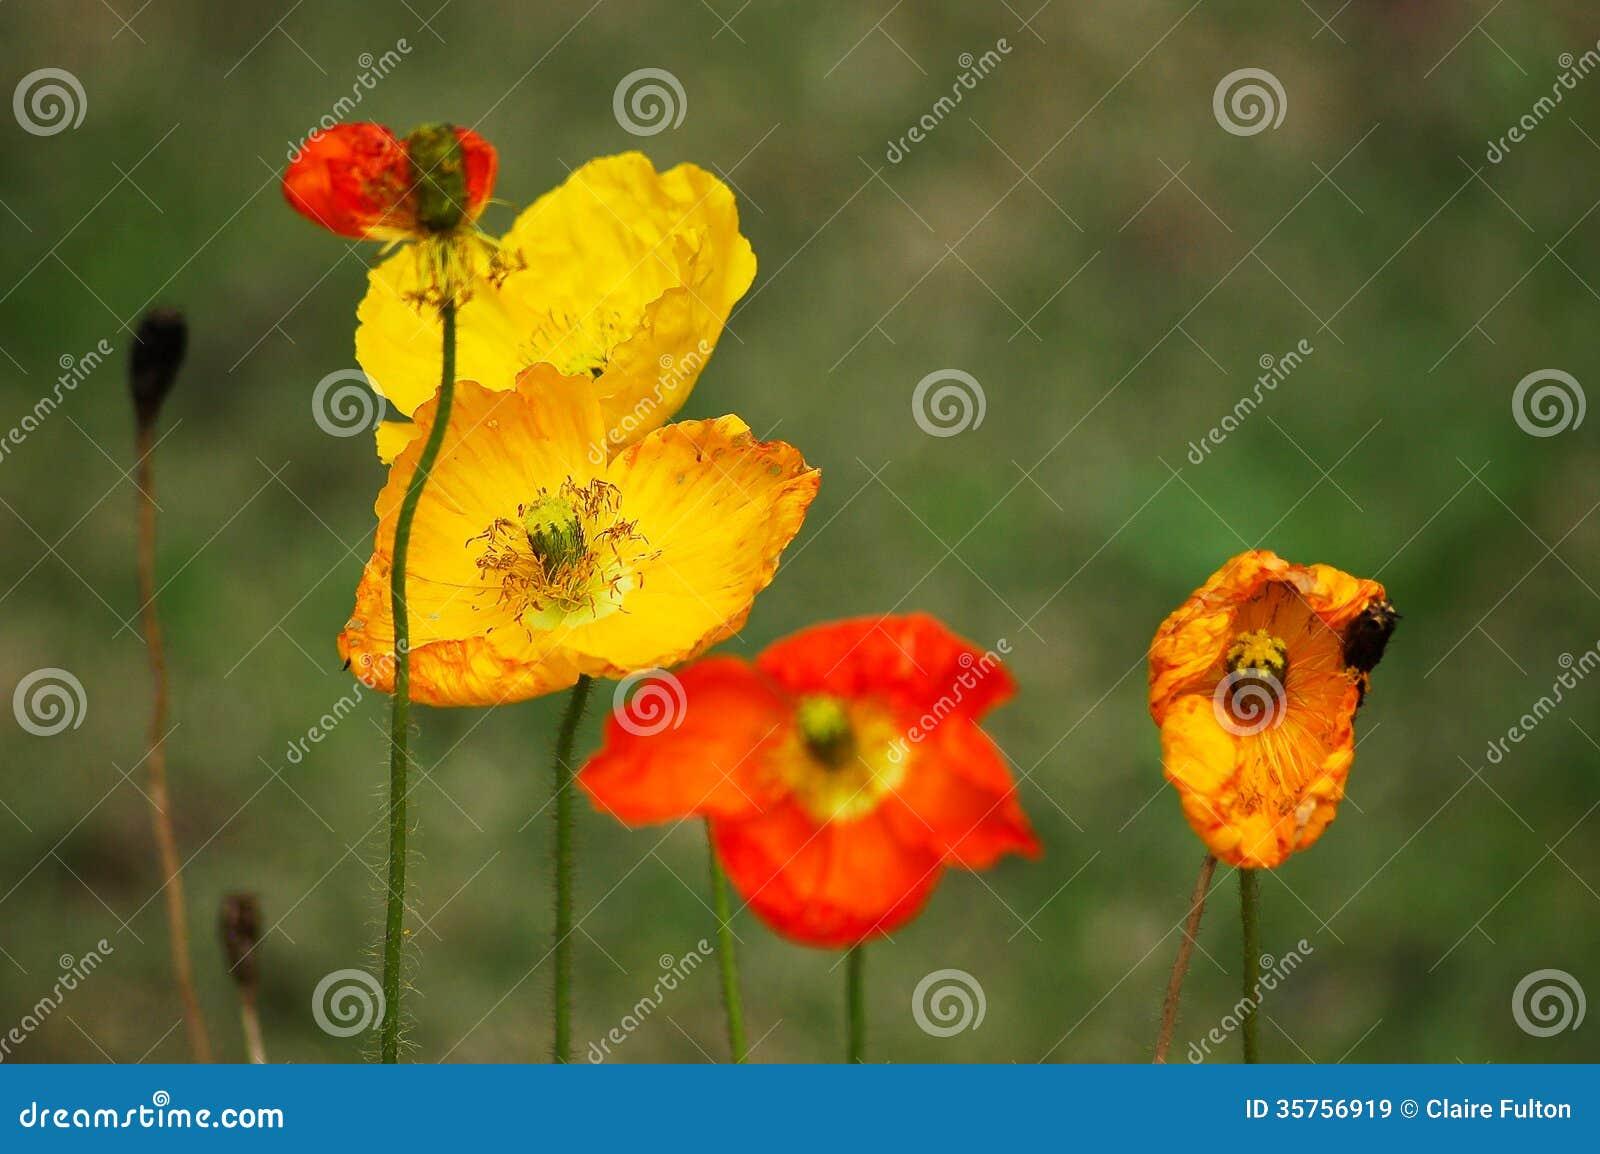 Red yellow poppy flowers stock image image of poppy 35756919 download comp mightylinksfo